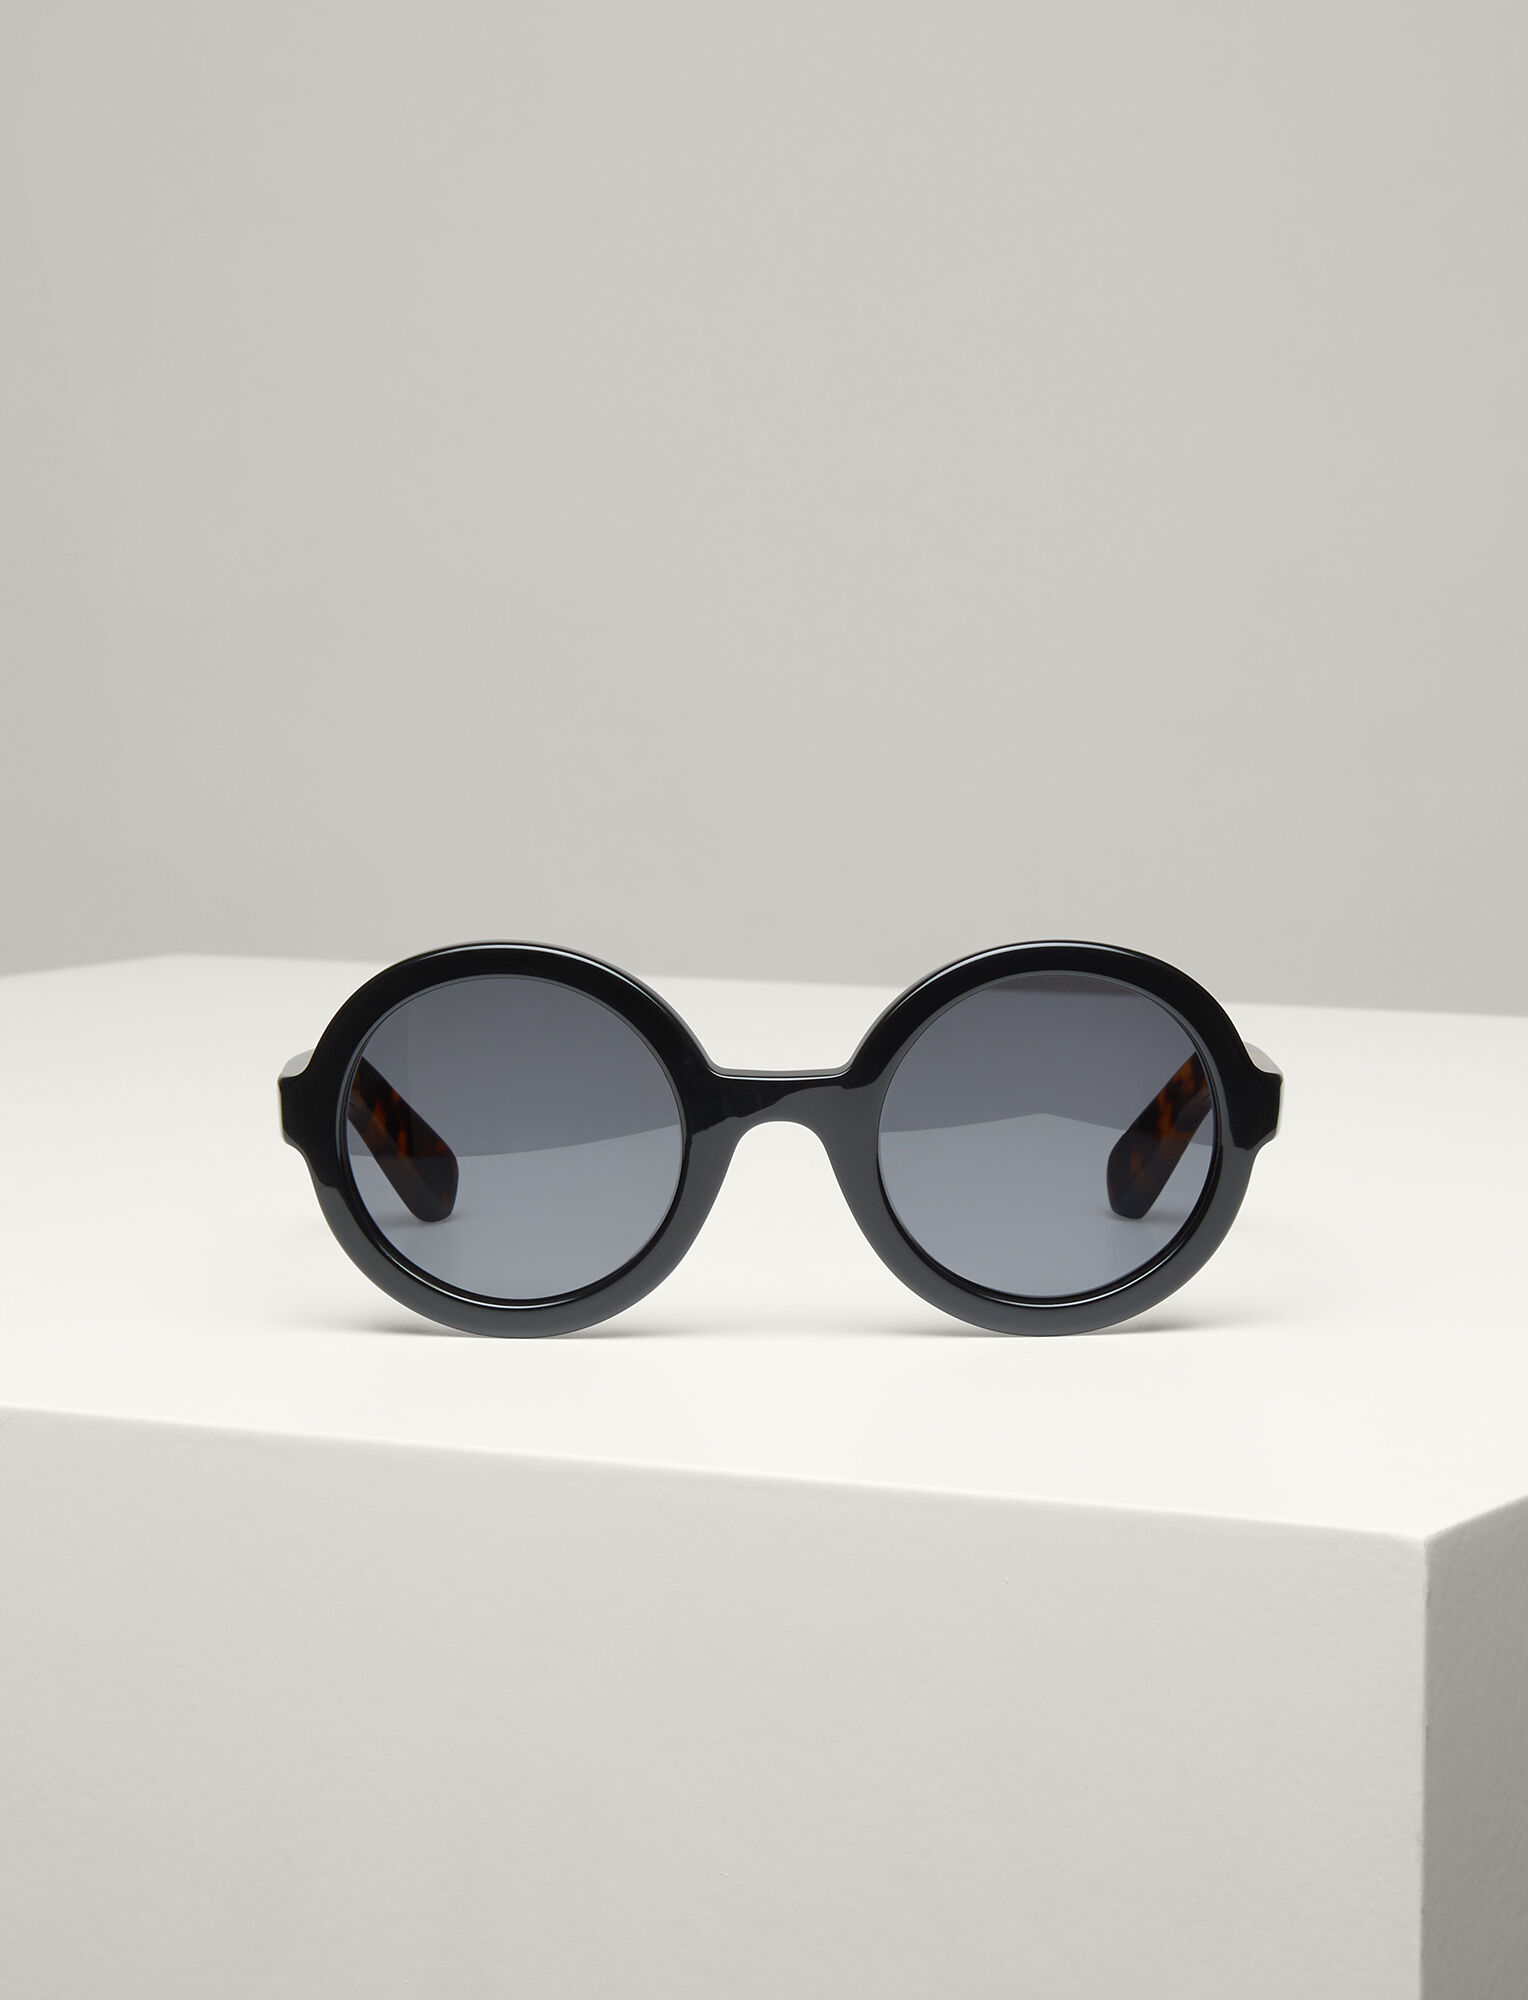 Draycott sunglasses - Black Joseph DvaRru0